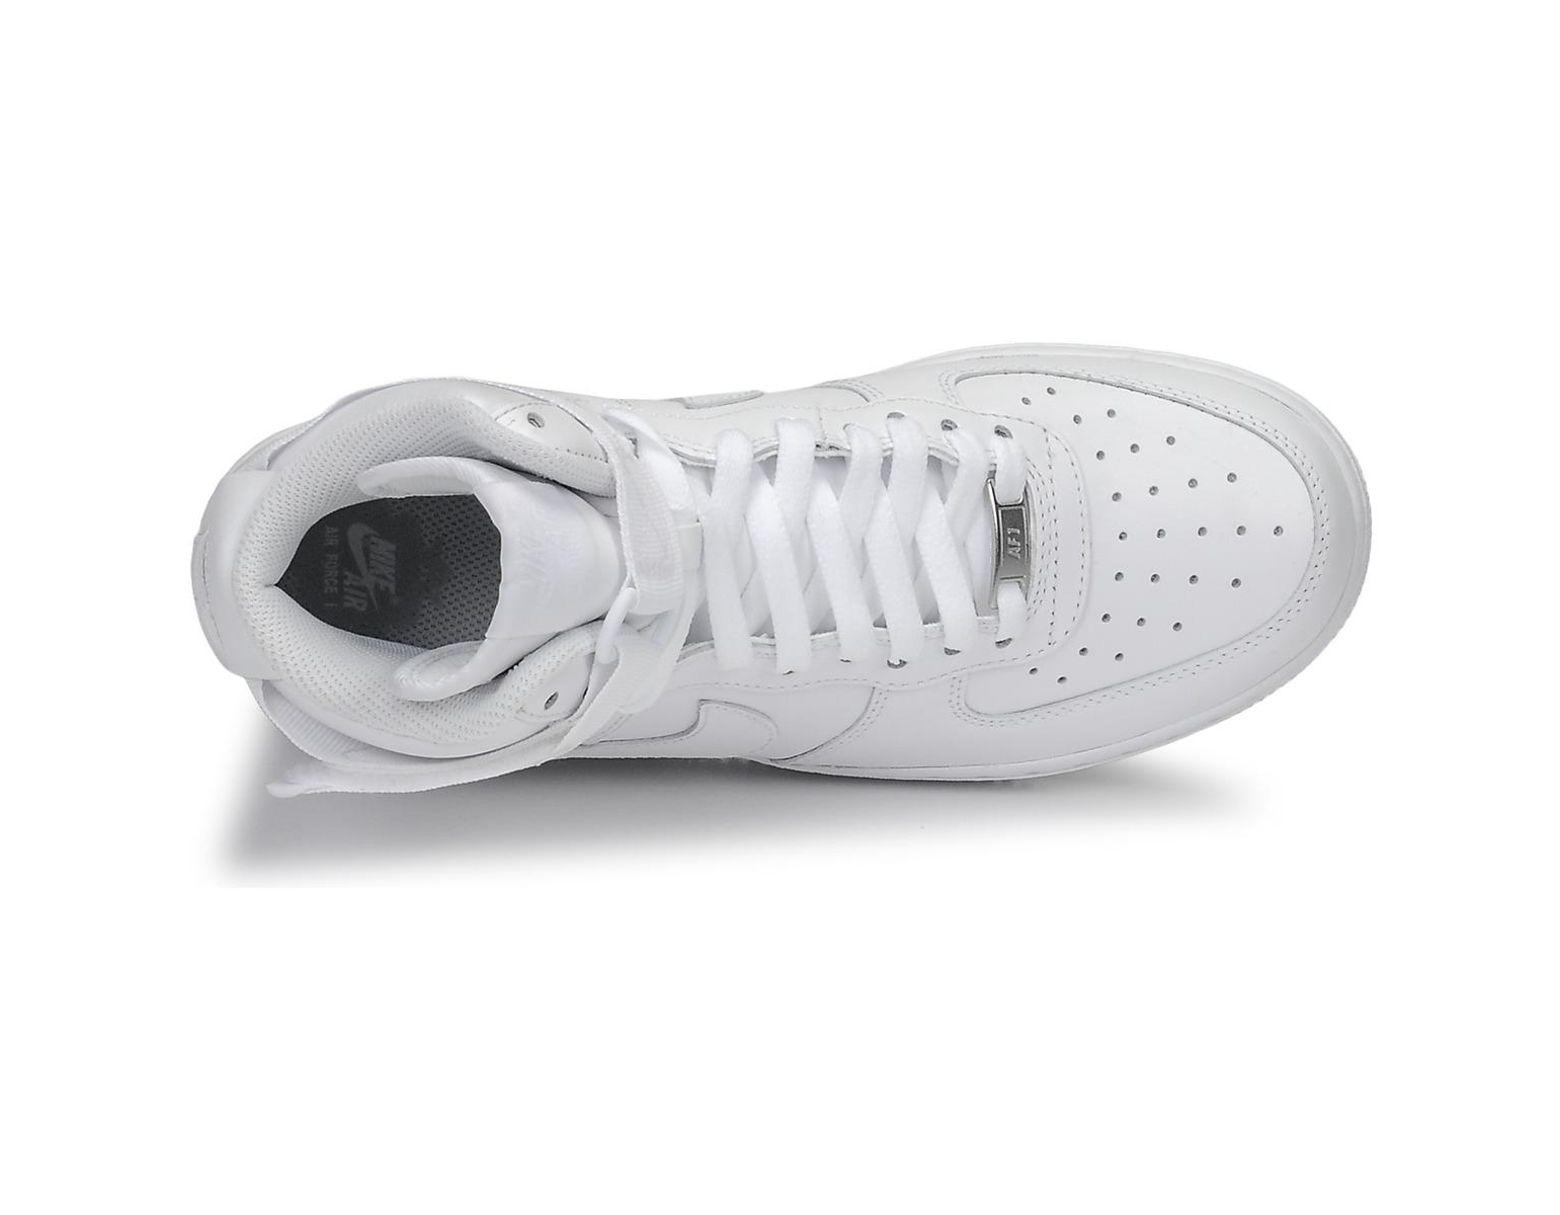 600Chaussures De Basketbal Nike 859527 600Chaussures De Basketbal Nike 859527 m0wN8n